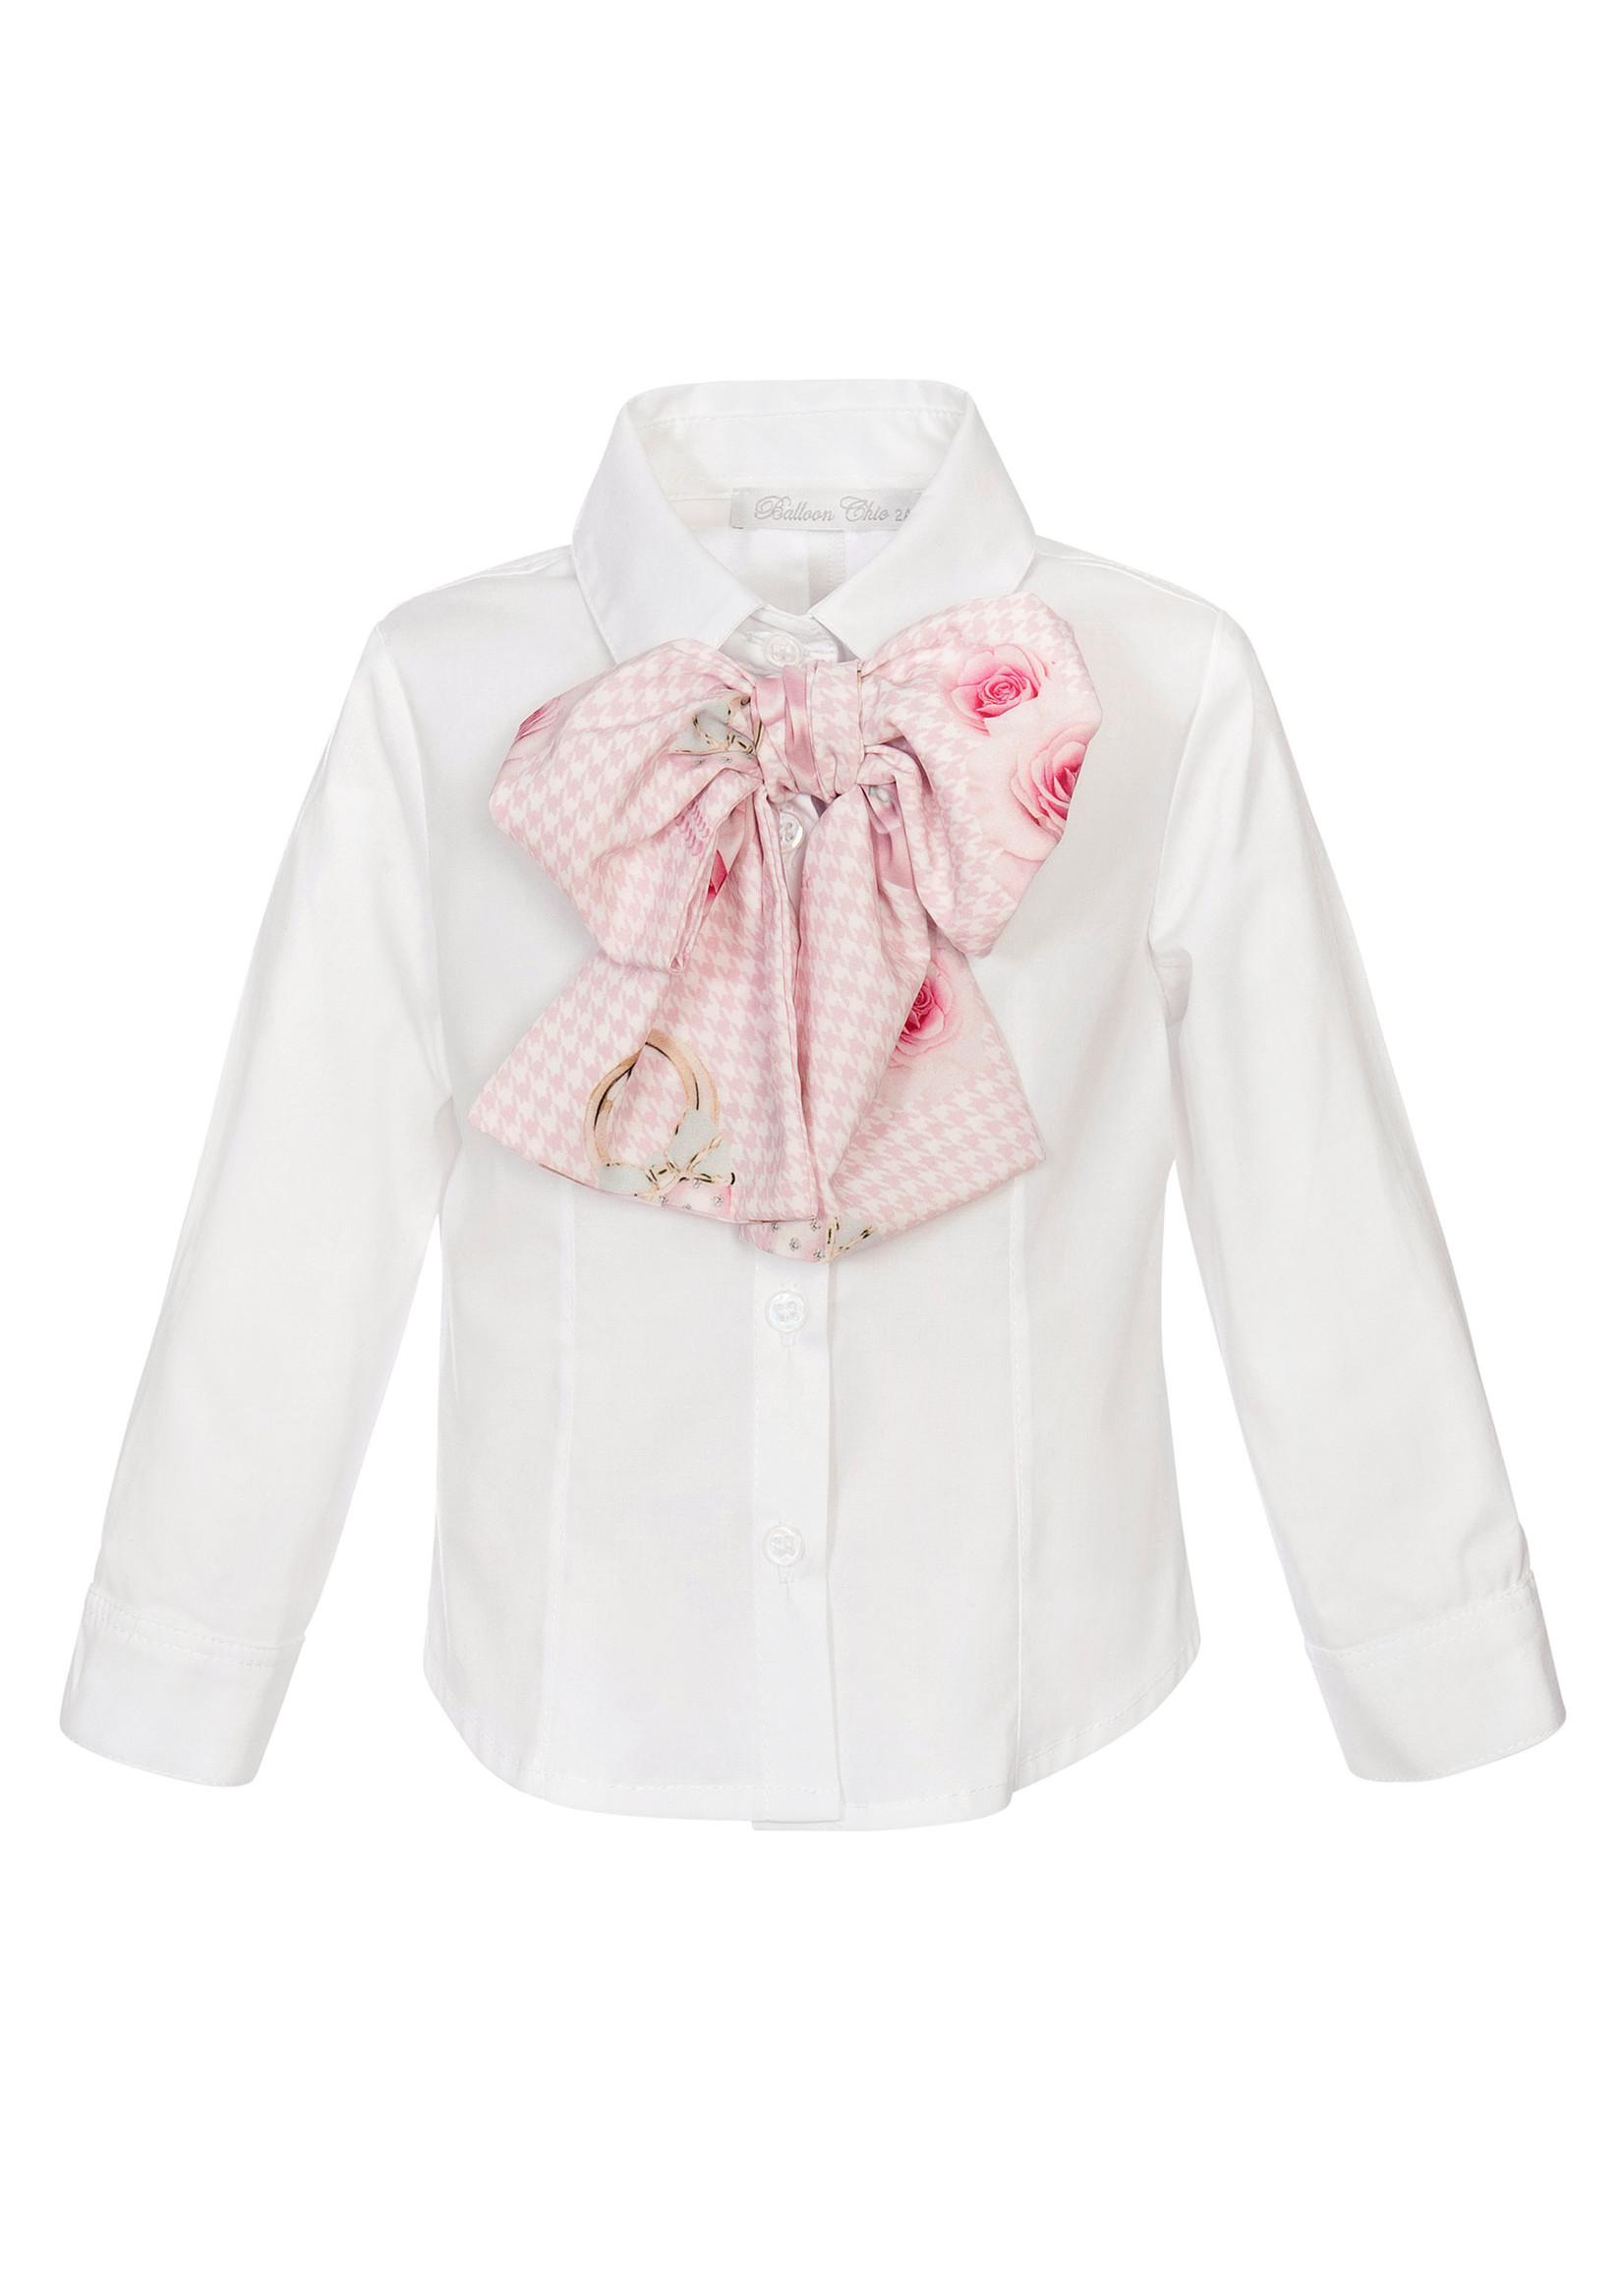 Balloon Chic Balloon Chic blouse wit met strik roze